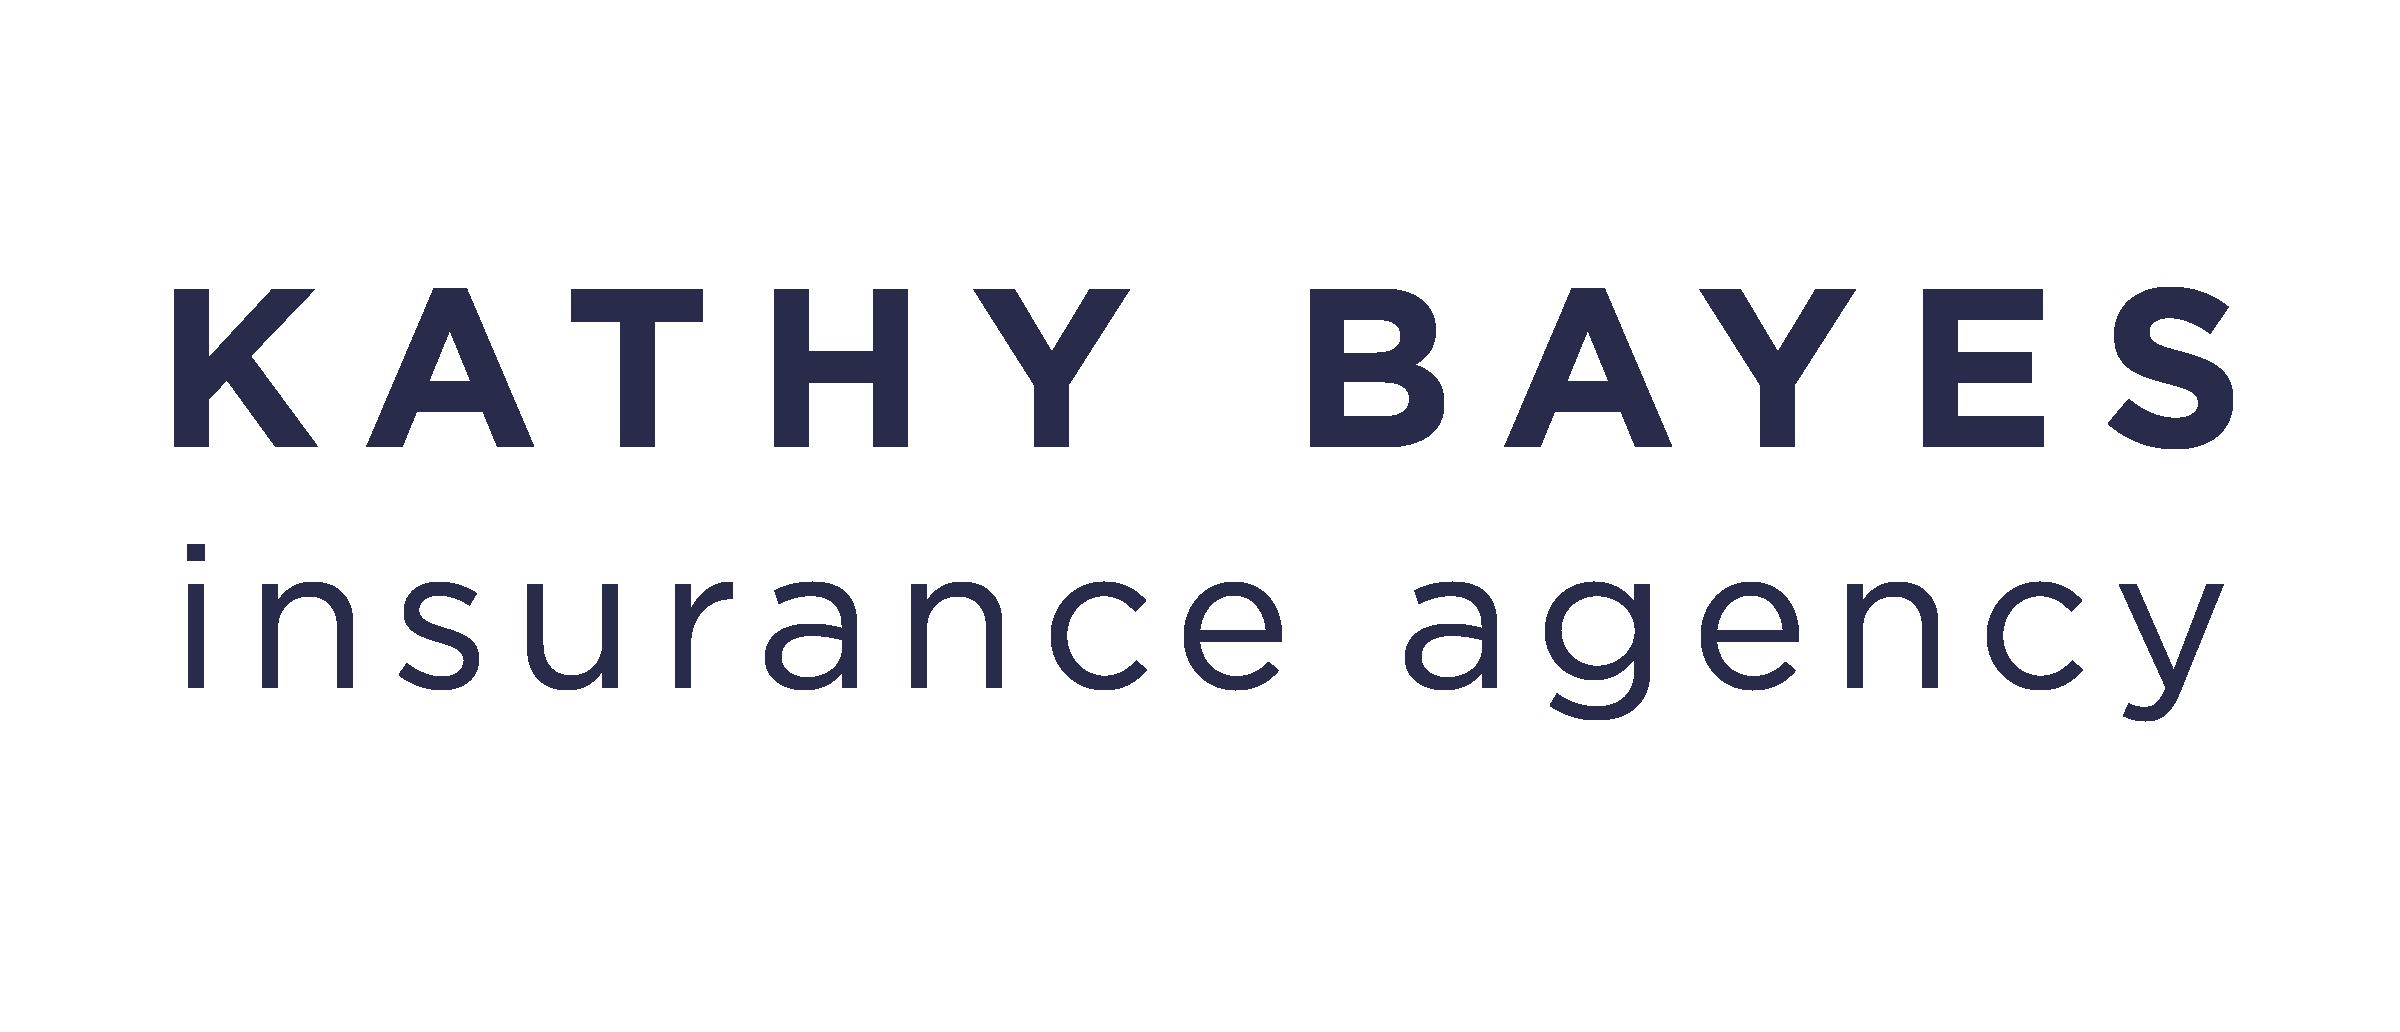 Kathy Bayes Insurance